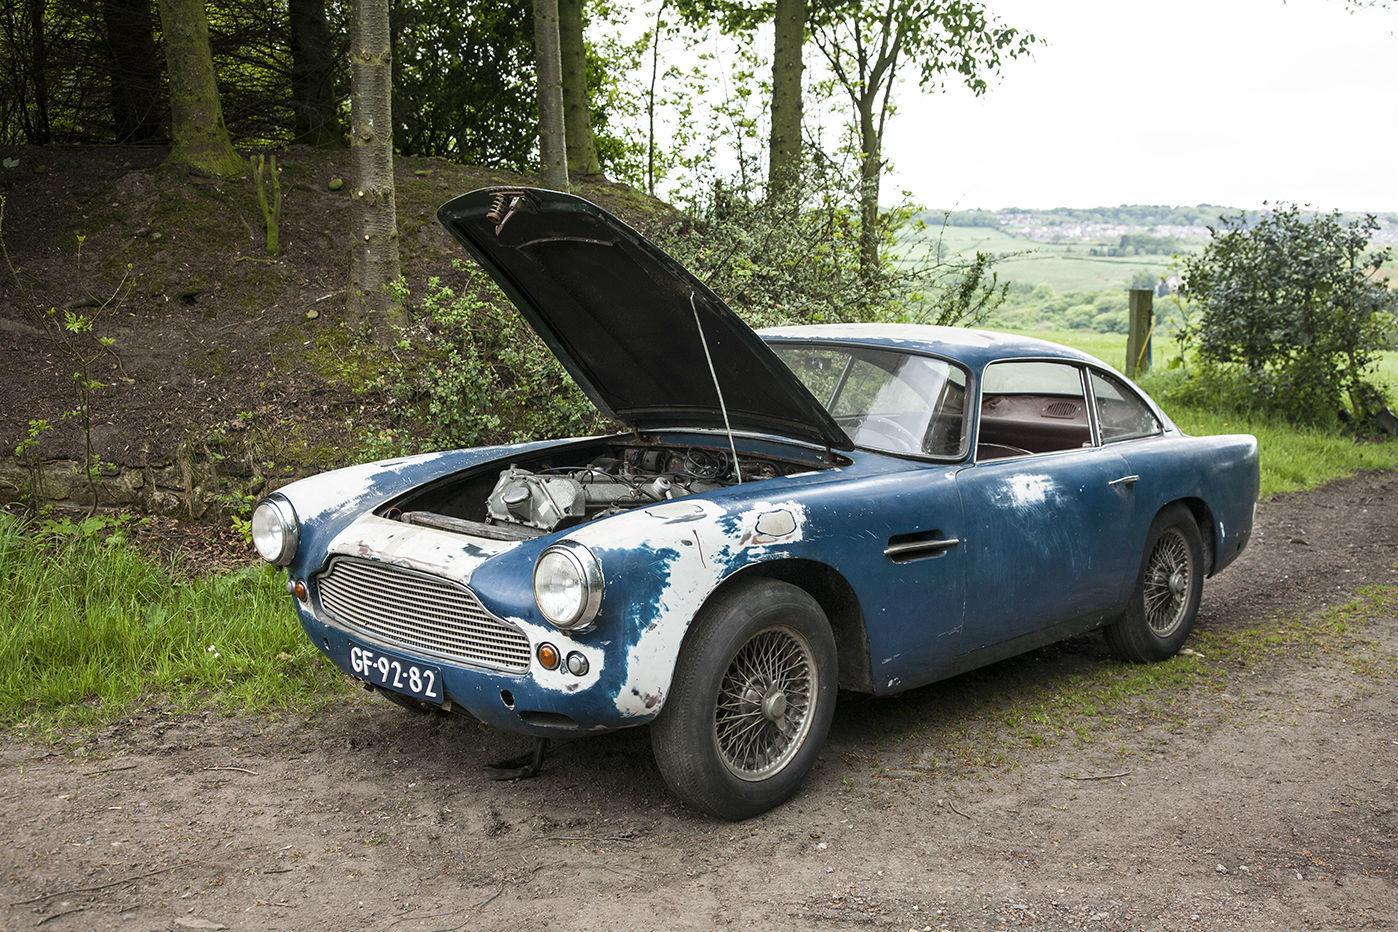 Aston Martin DB4 Series I barnfind (8)